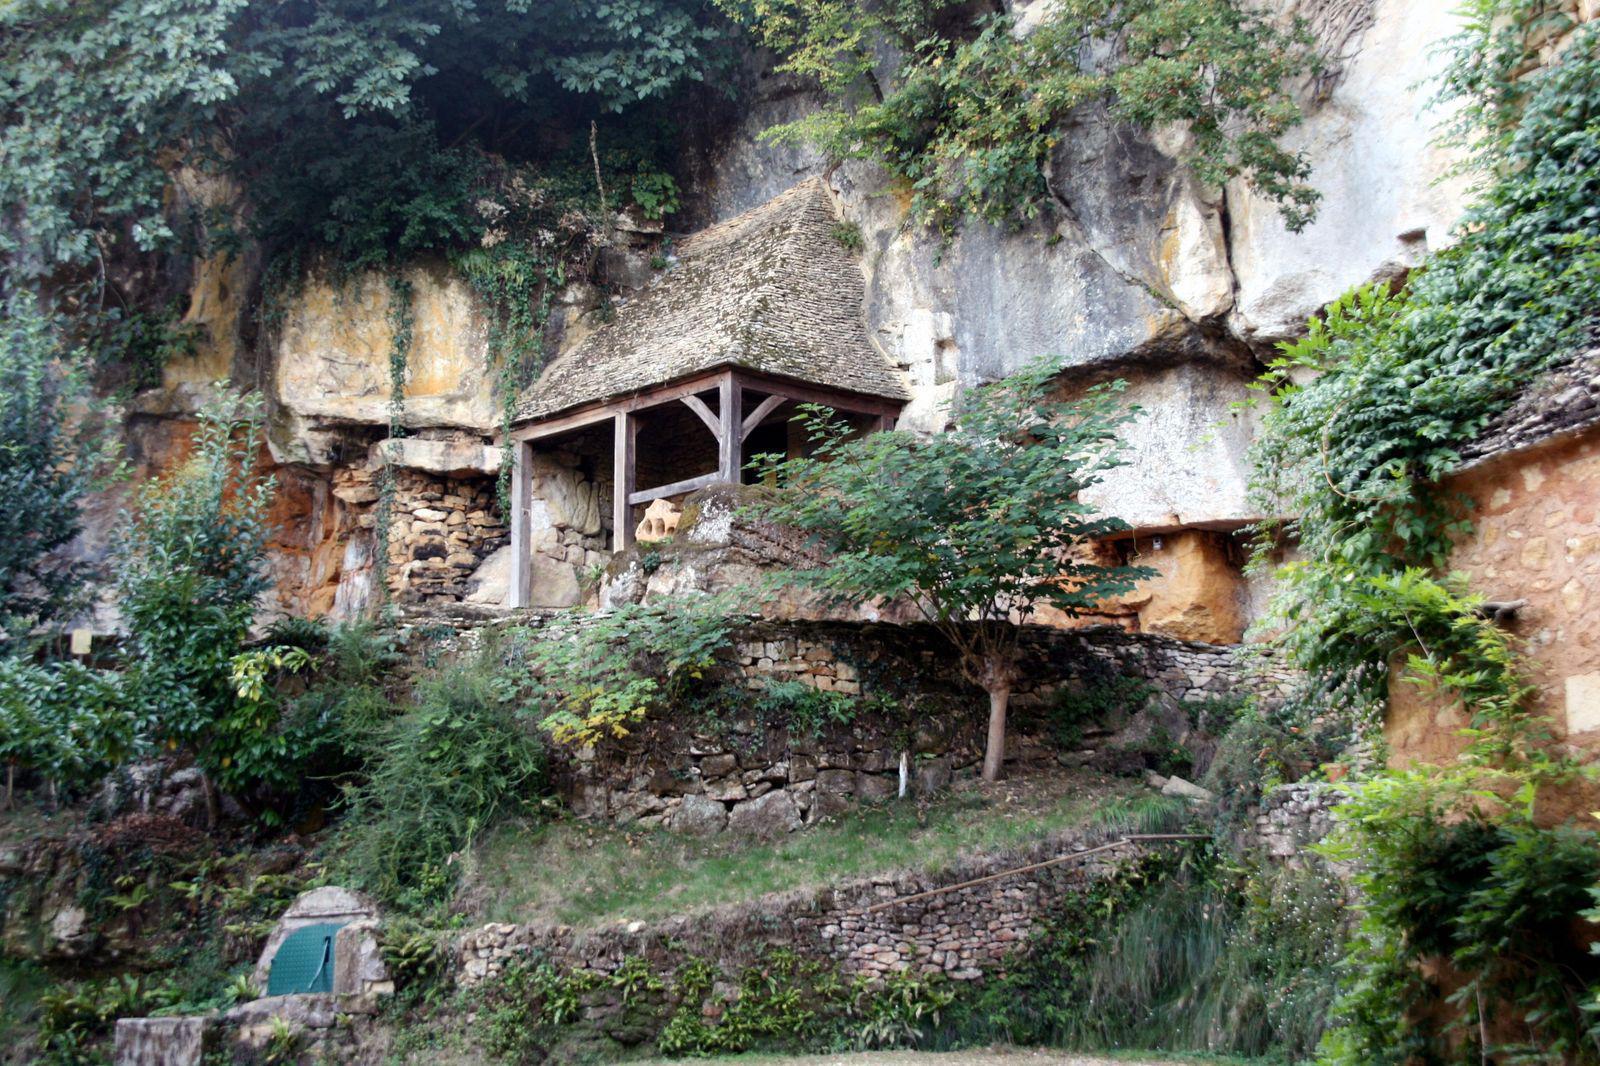 Image : Grotte du Sorcier